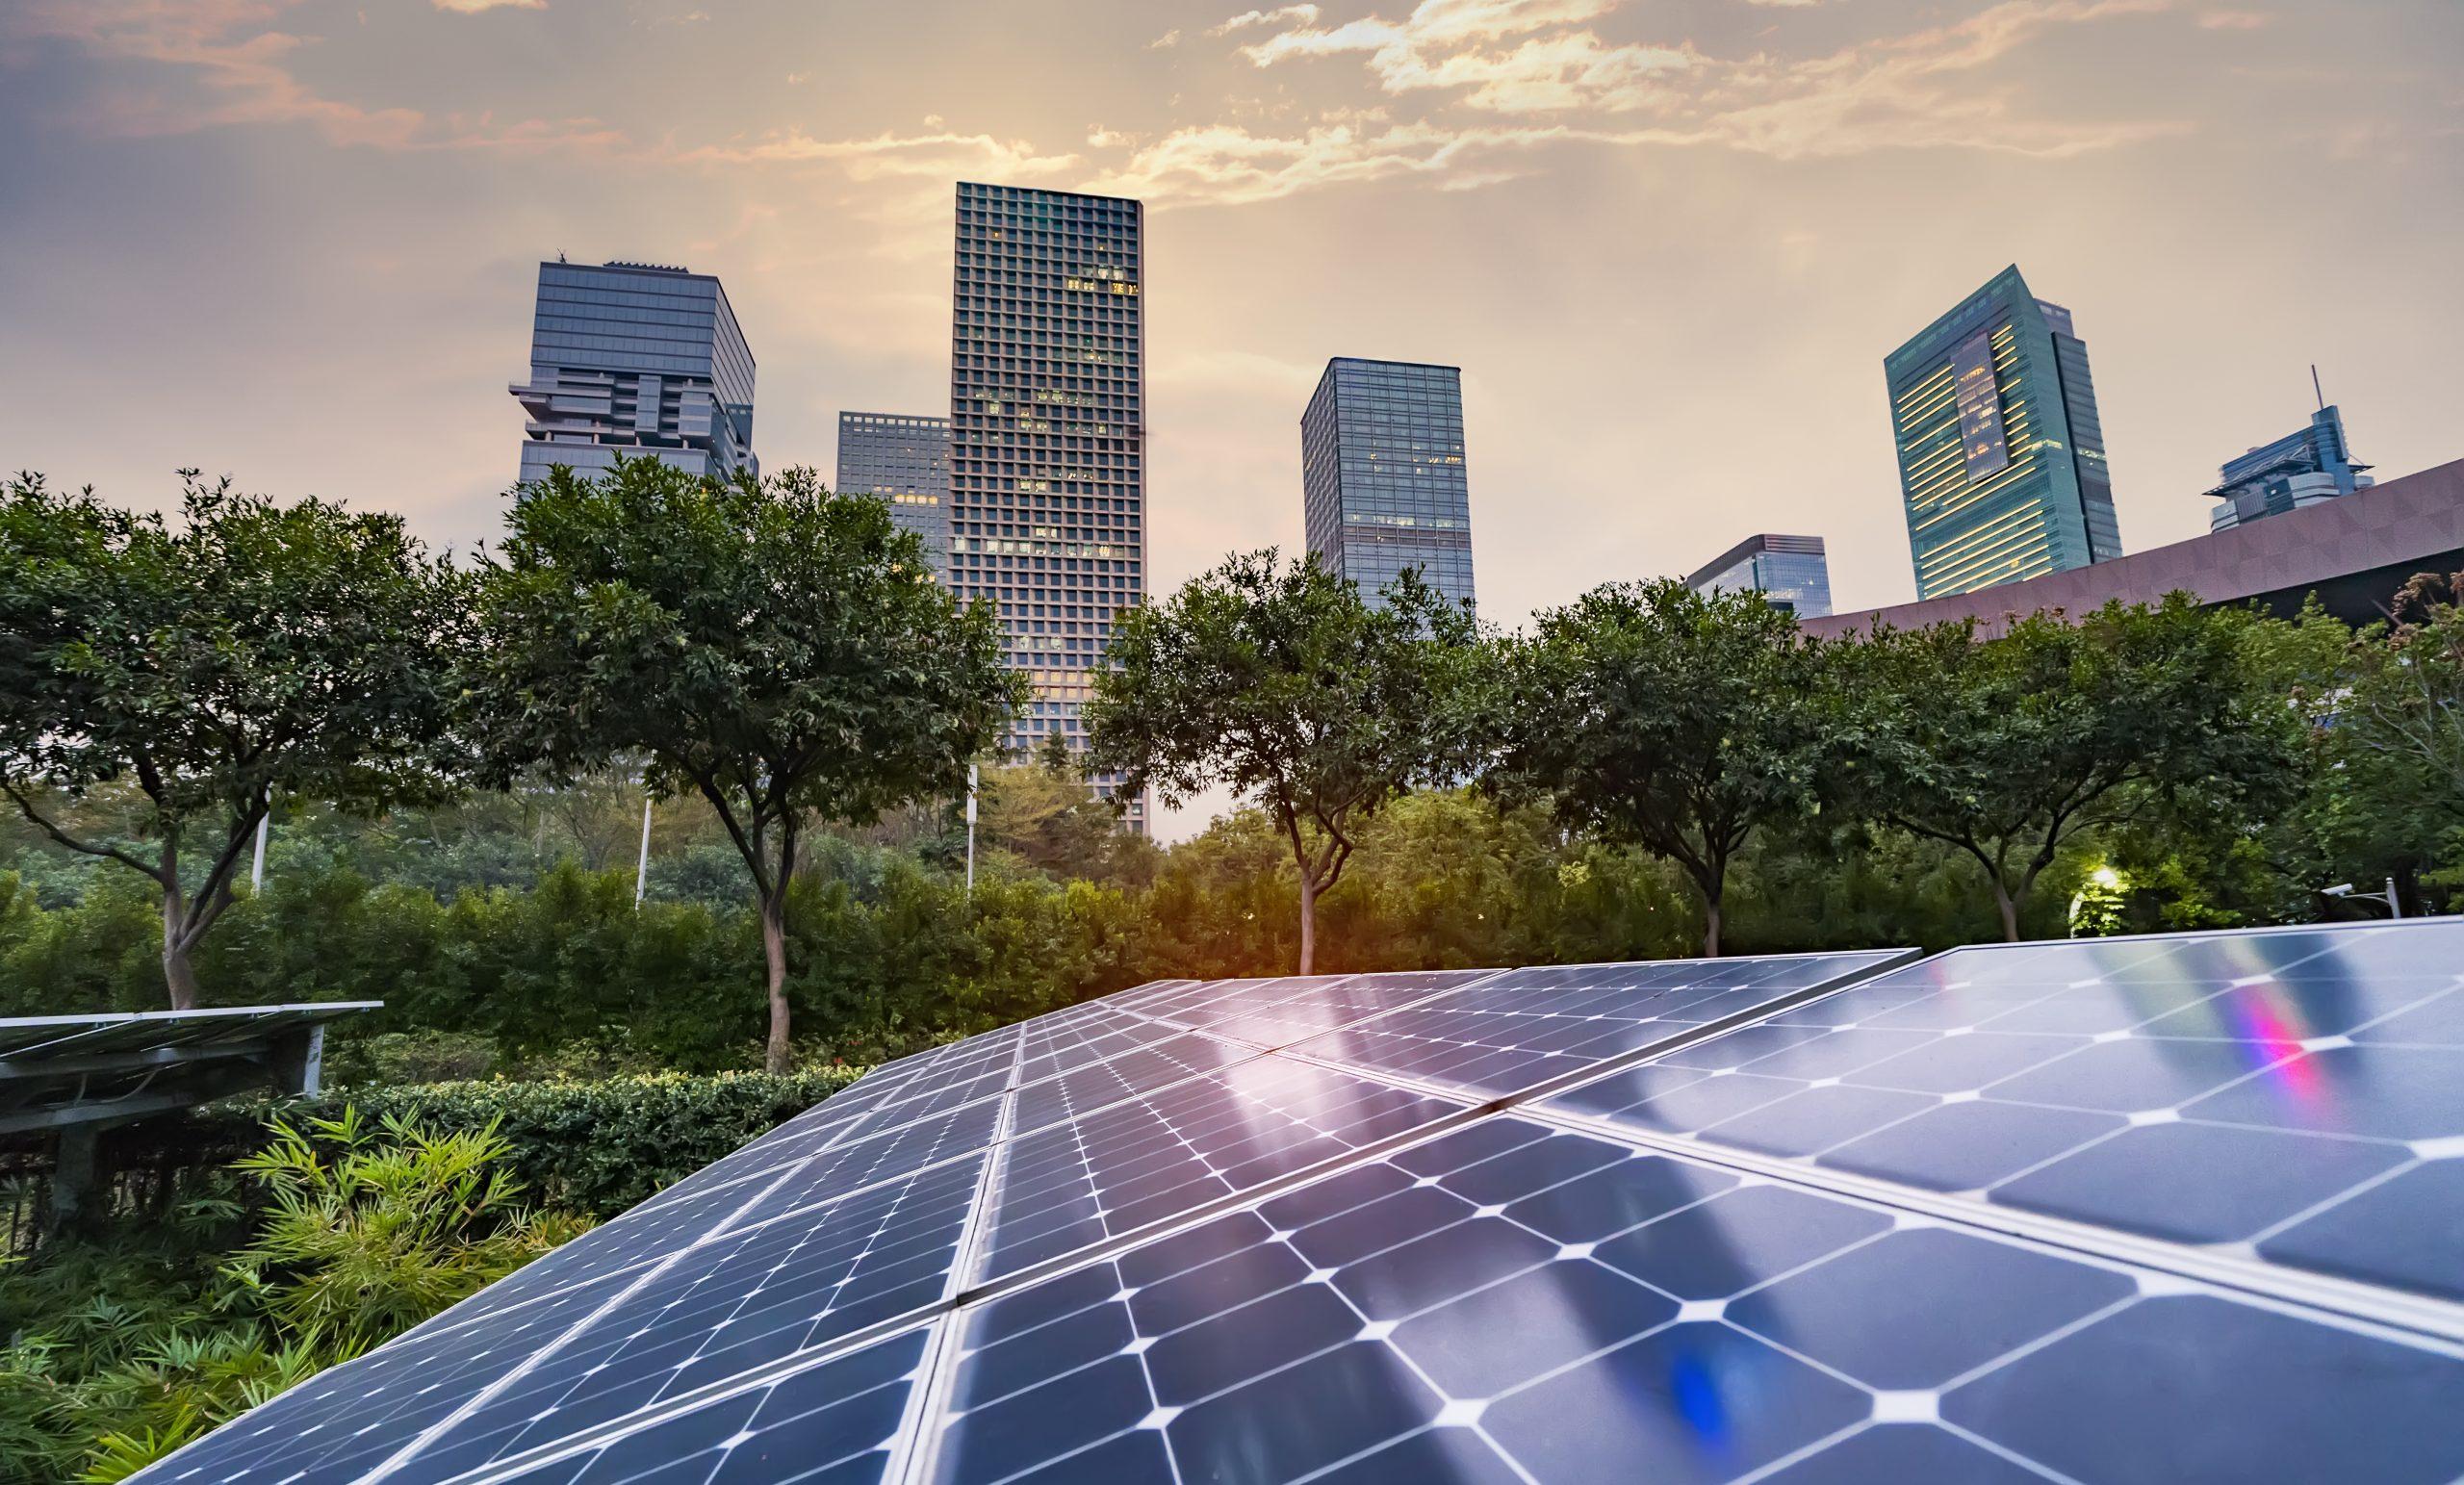 Solar energy makes sense in US